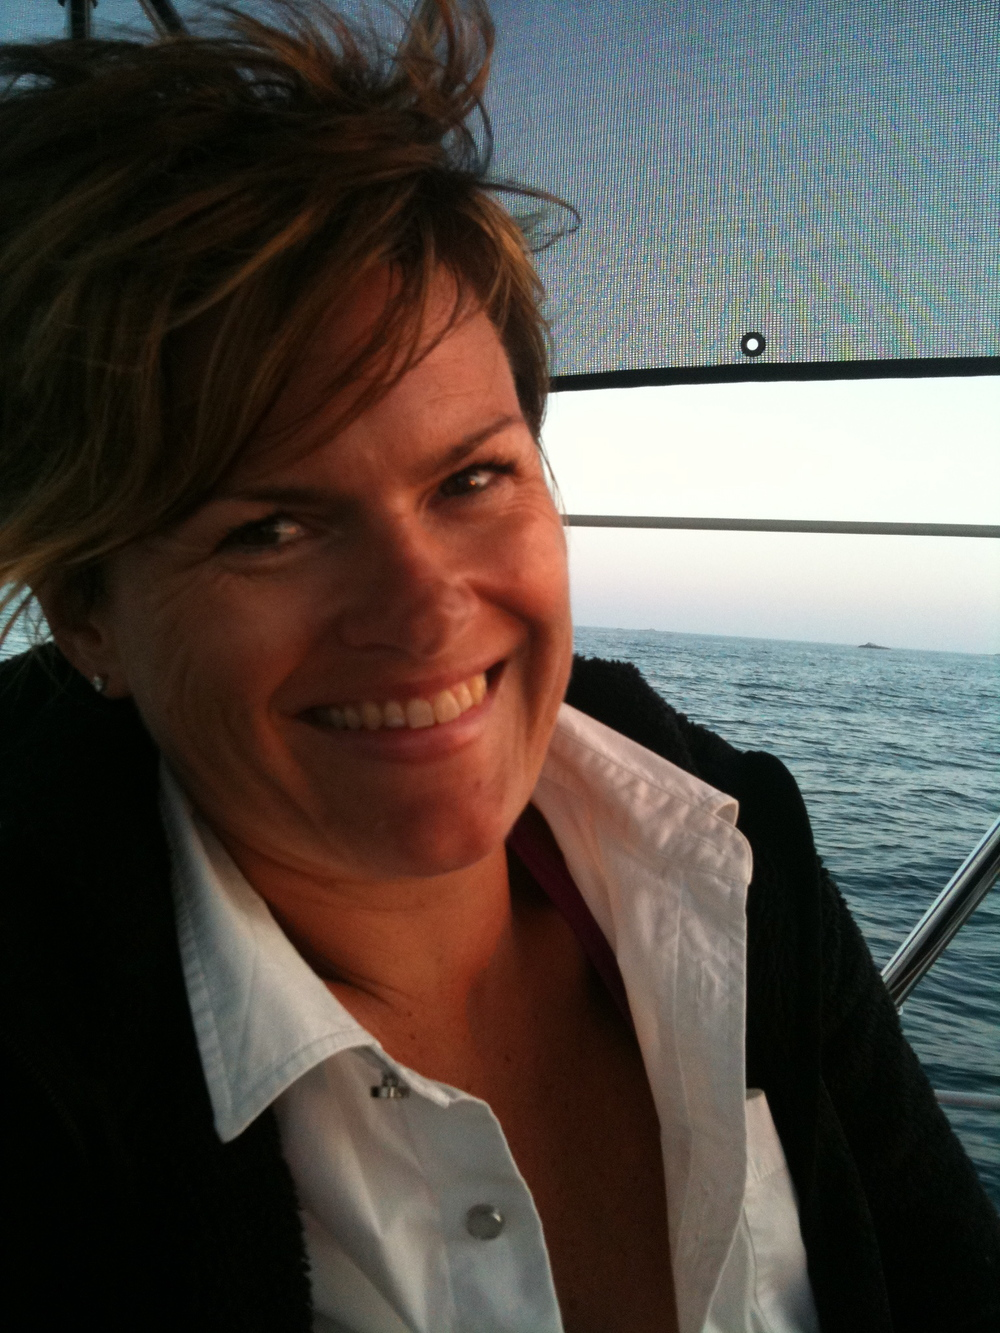 Branding designer, amateur photographer, mother, sailing enthusiast...